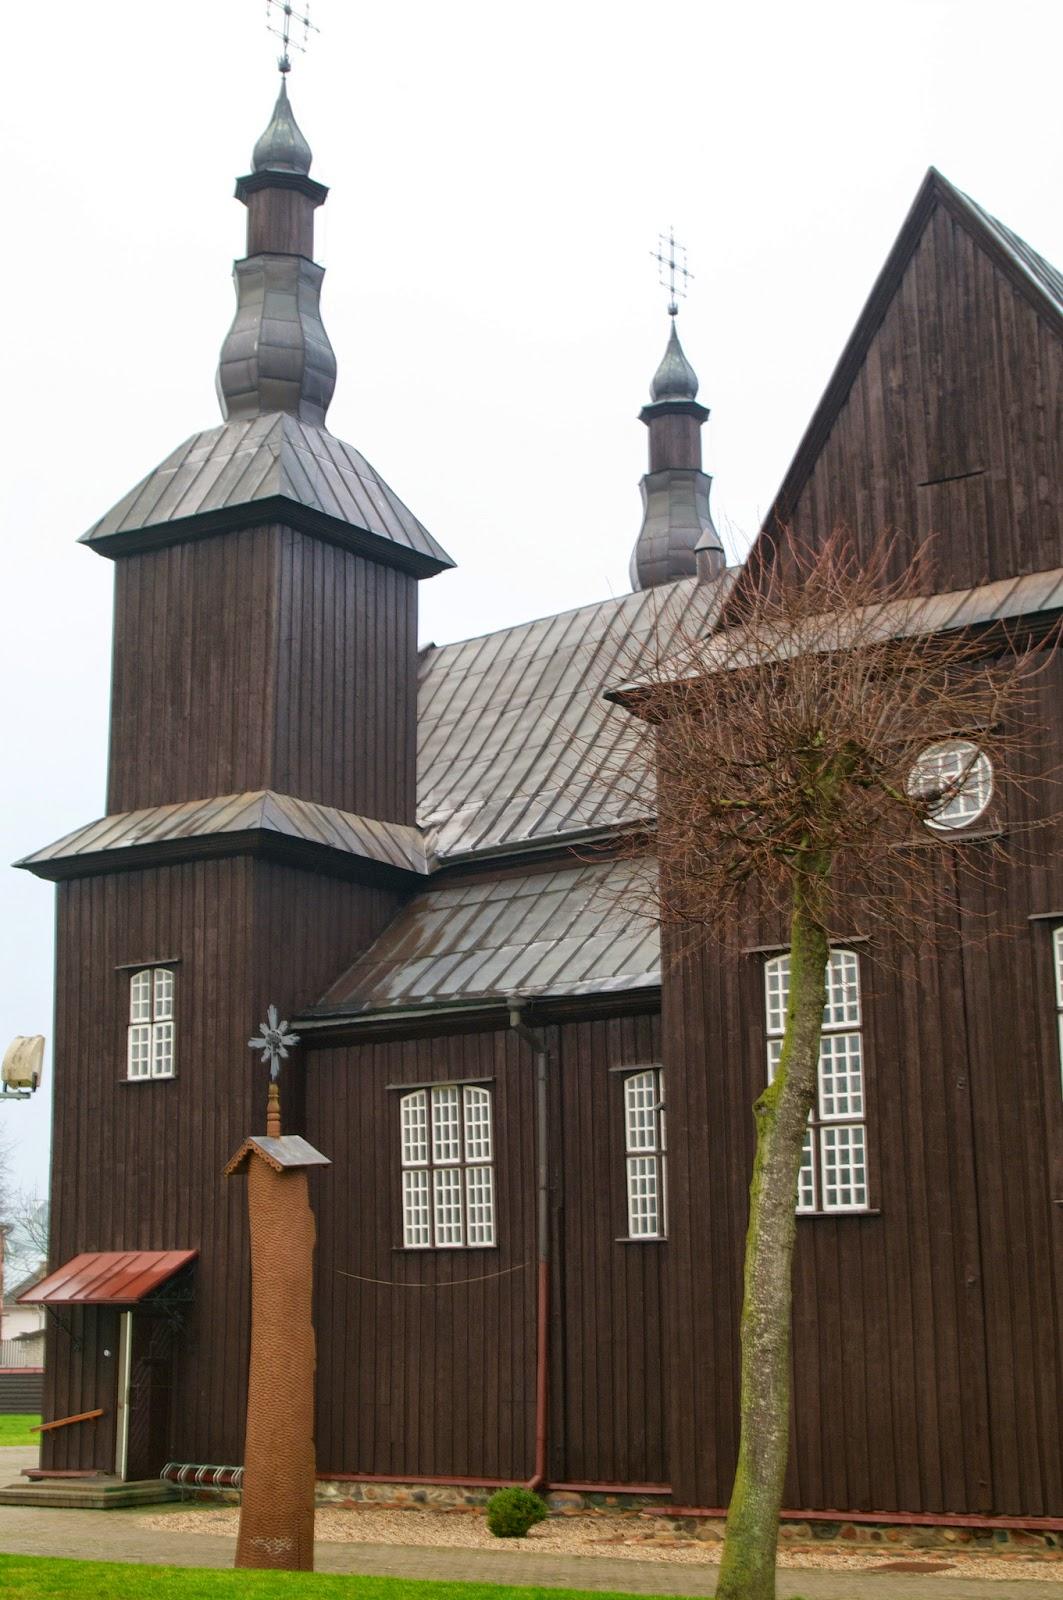 Костел Святого Иосифа, Кедайняй, Литва